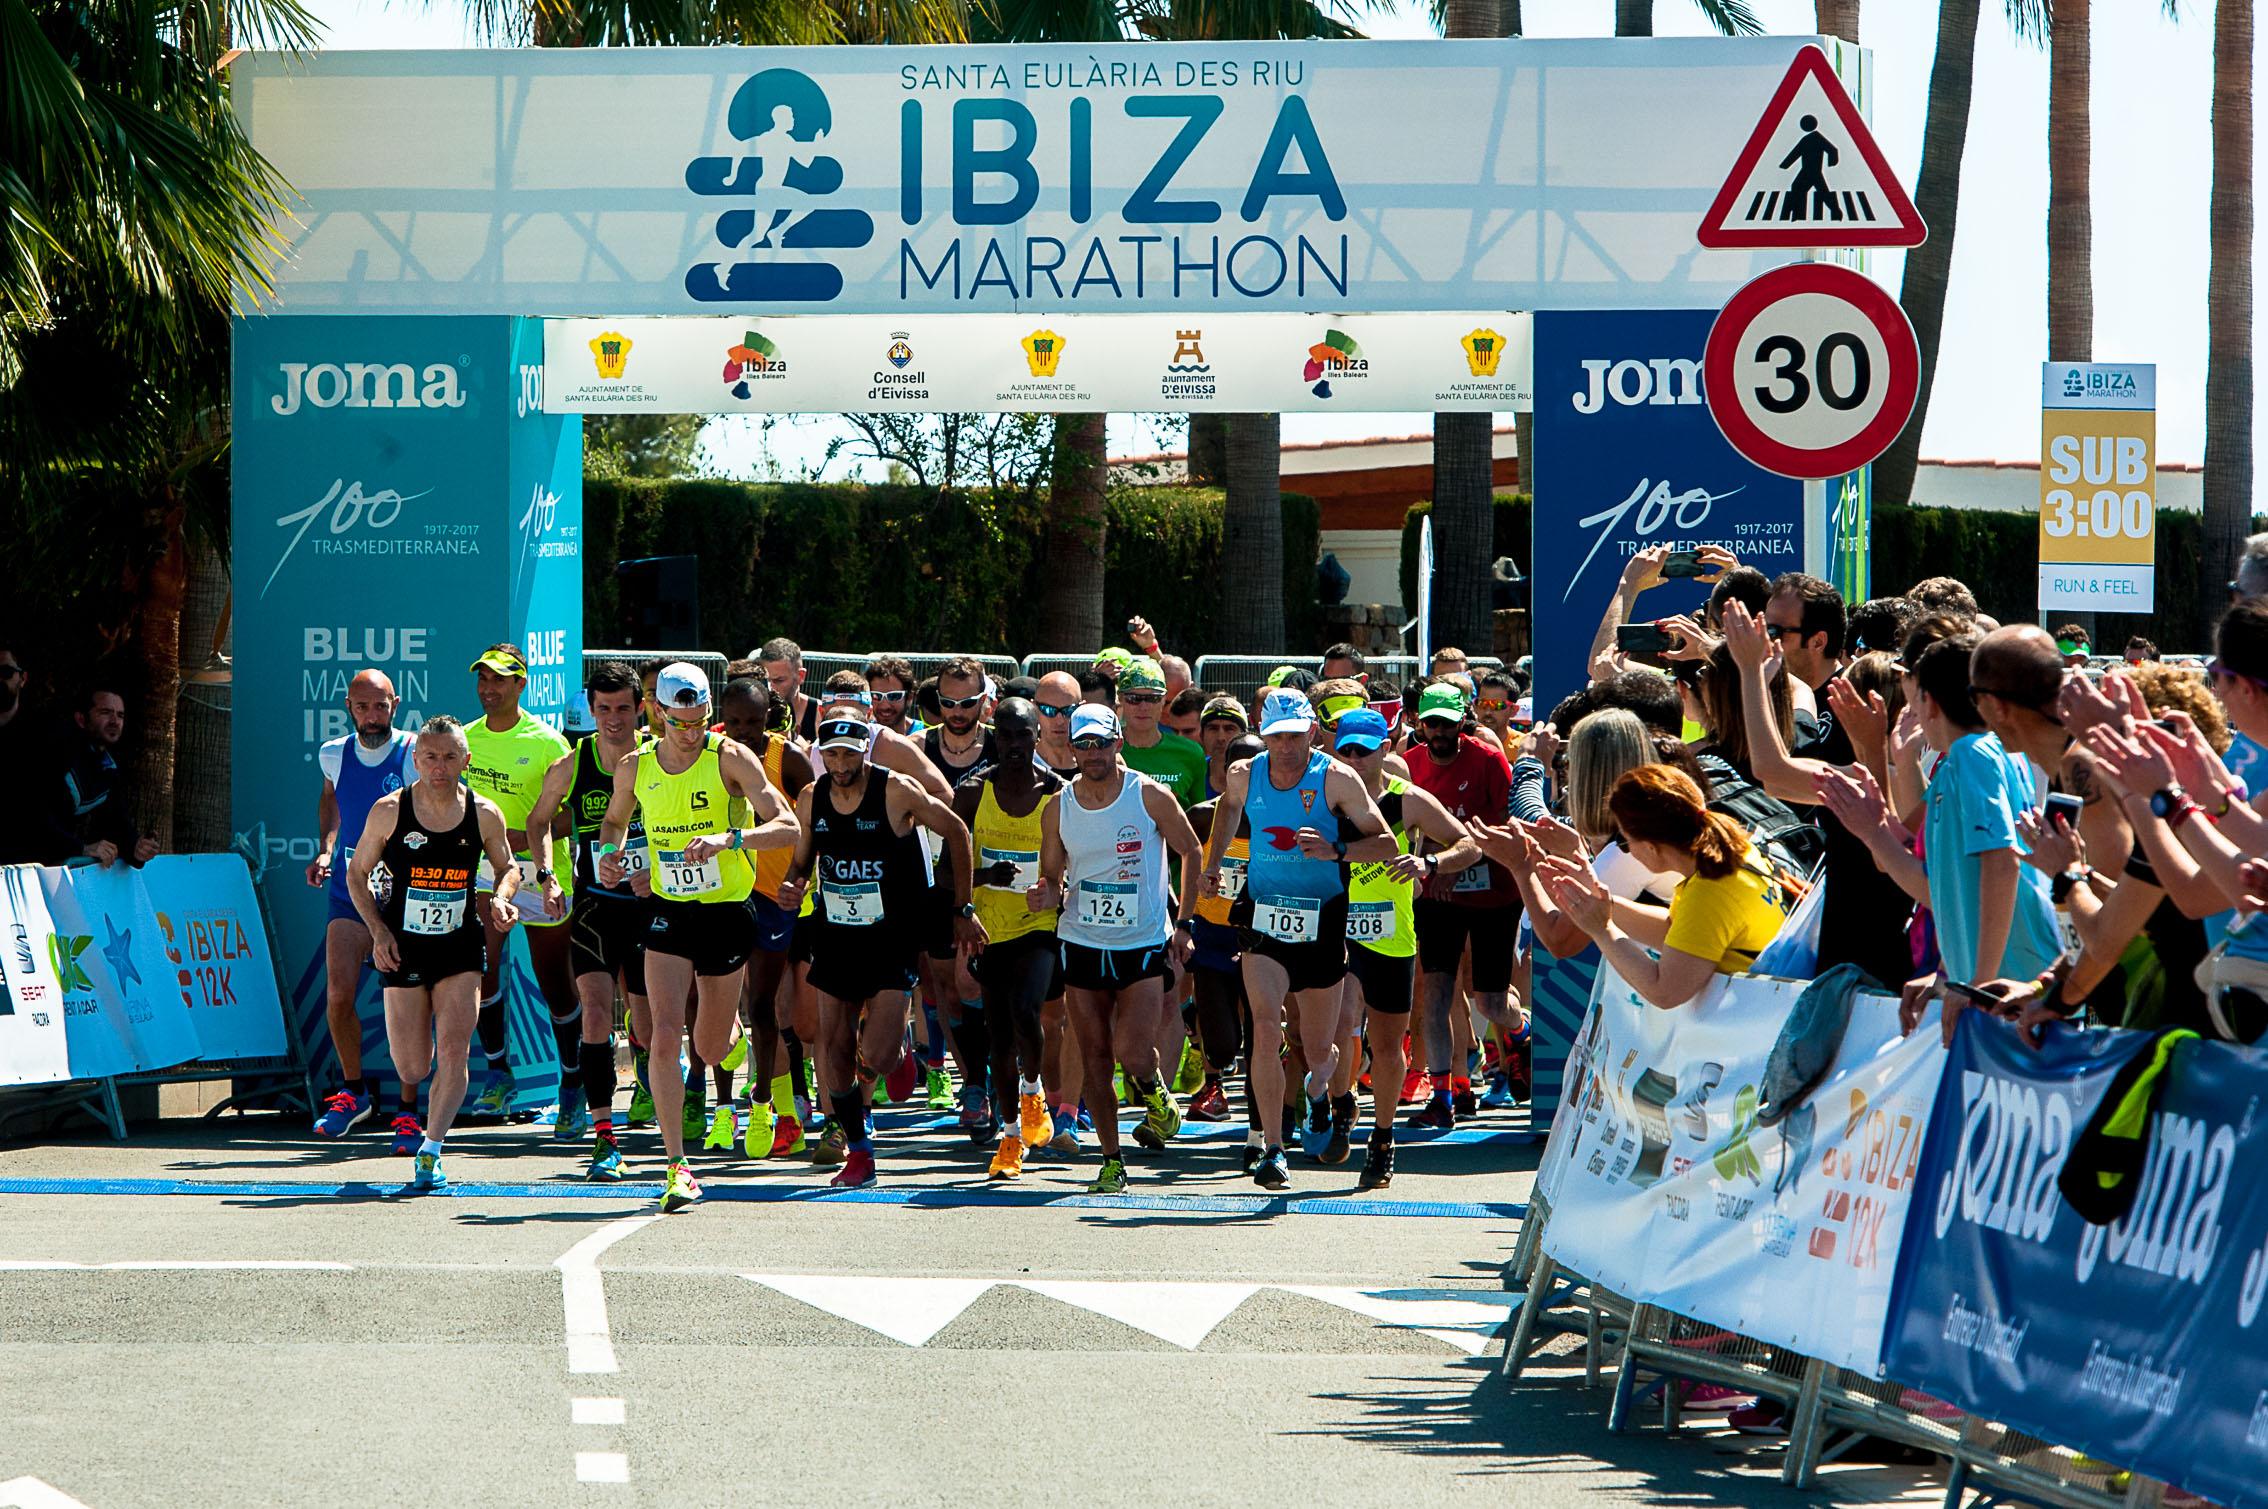 duquesaplaya.com ibiza marathon salida